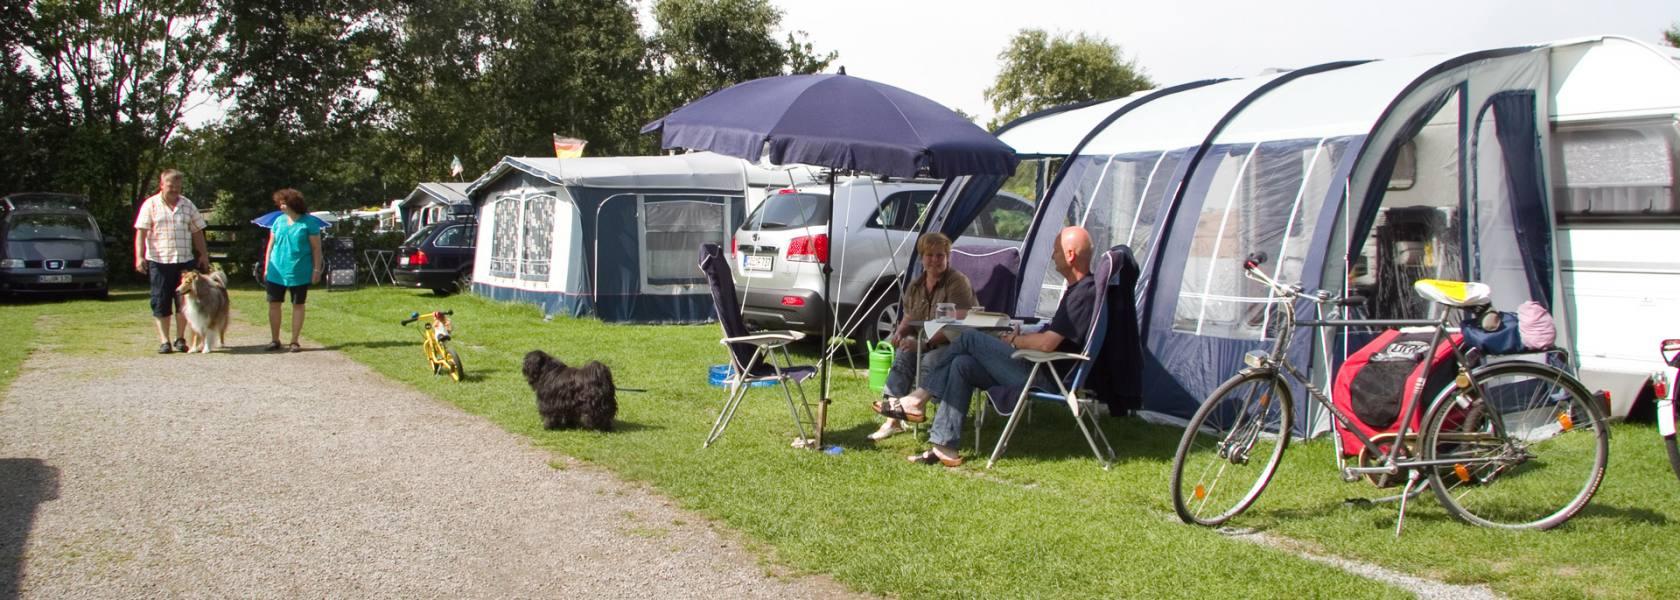 Camping mit Hund, © Nordsee-Camp Norddeich GmbH